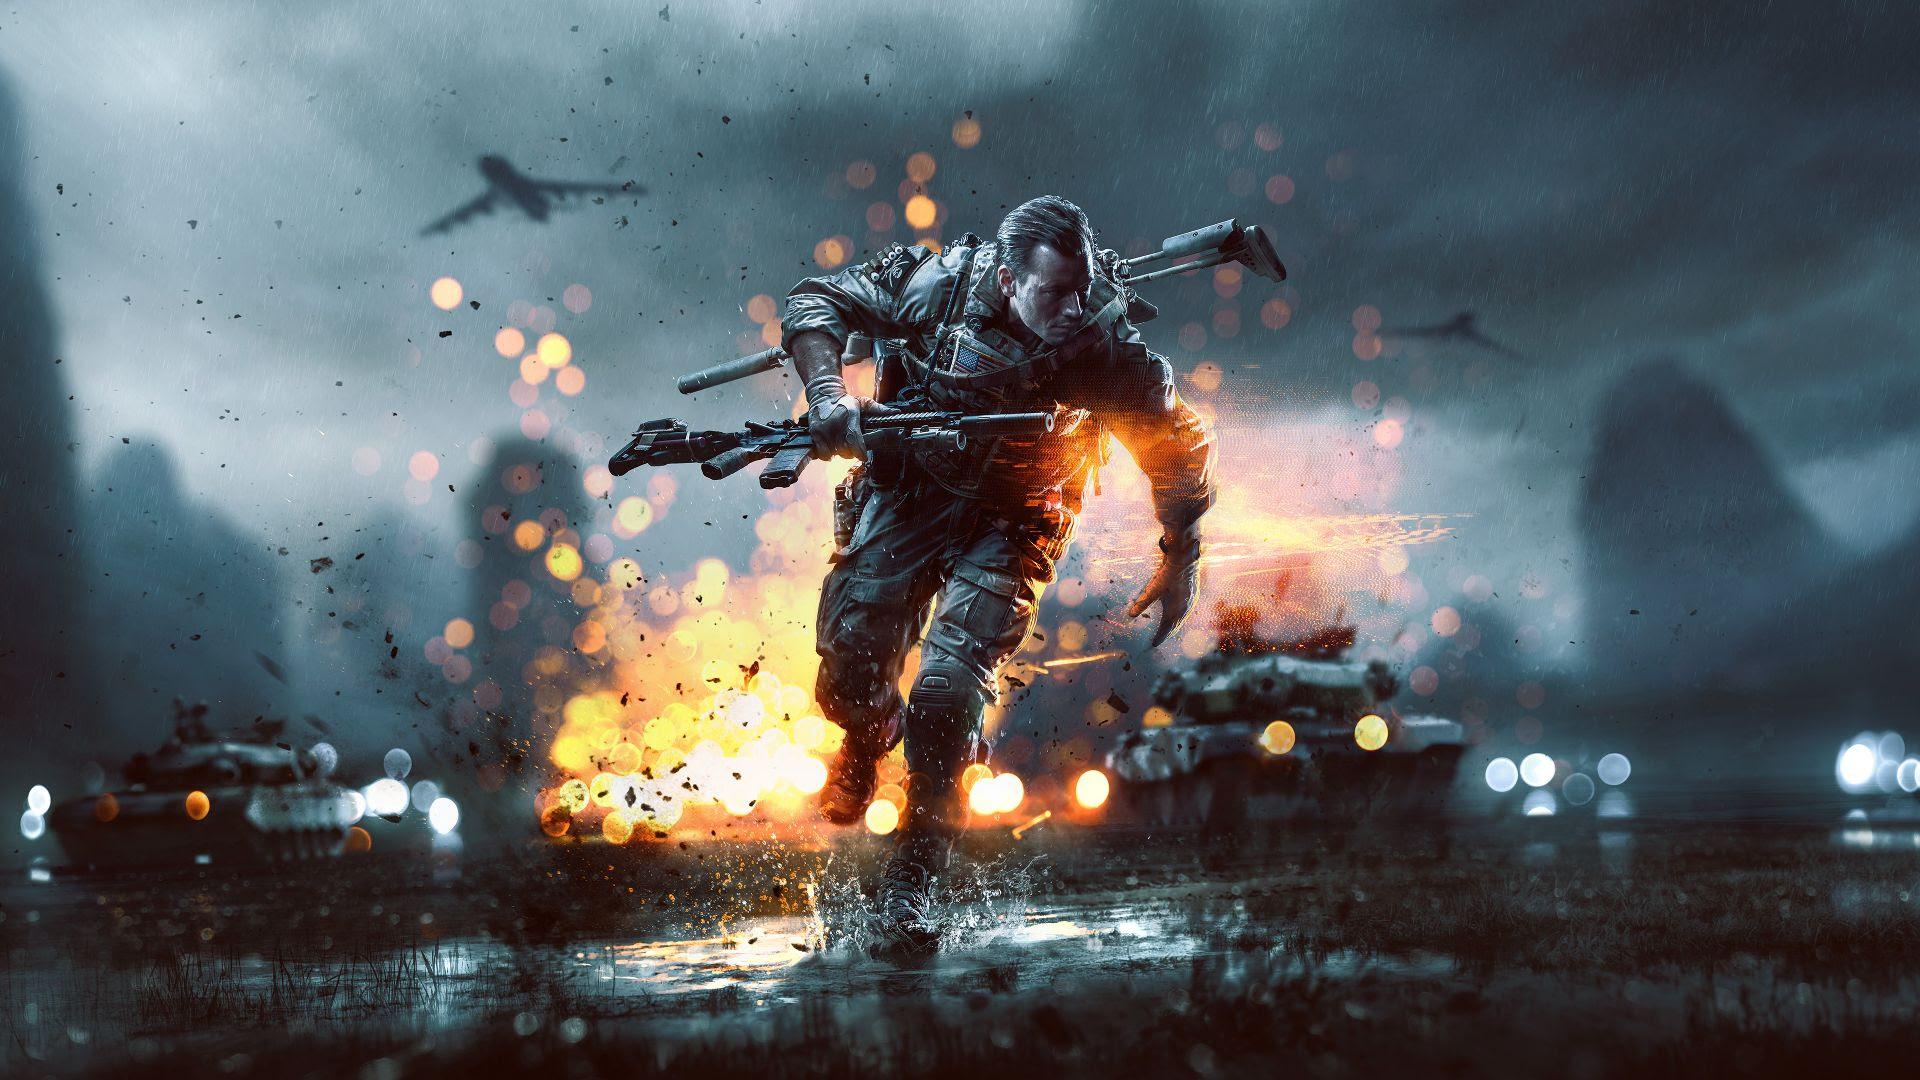 Battlefield 4 Backgrounds Nice Battlefield 4 1920x1080 17659